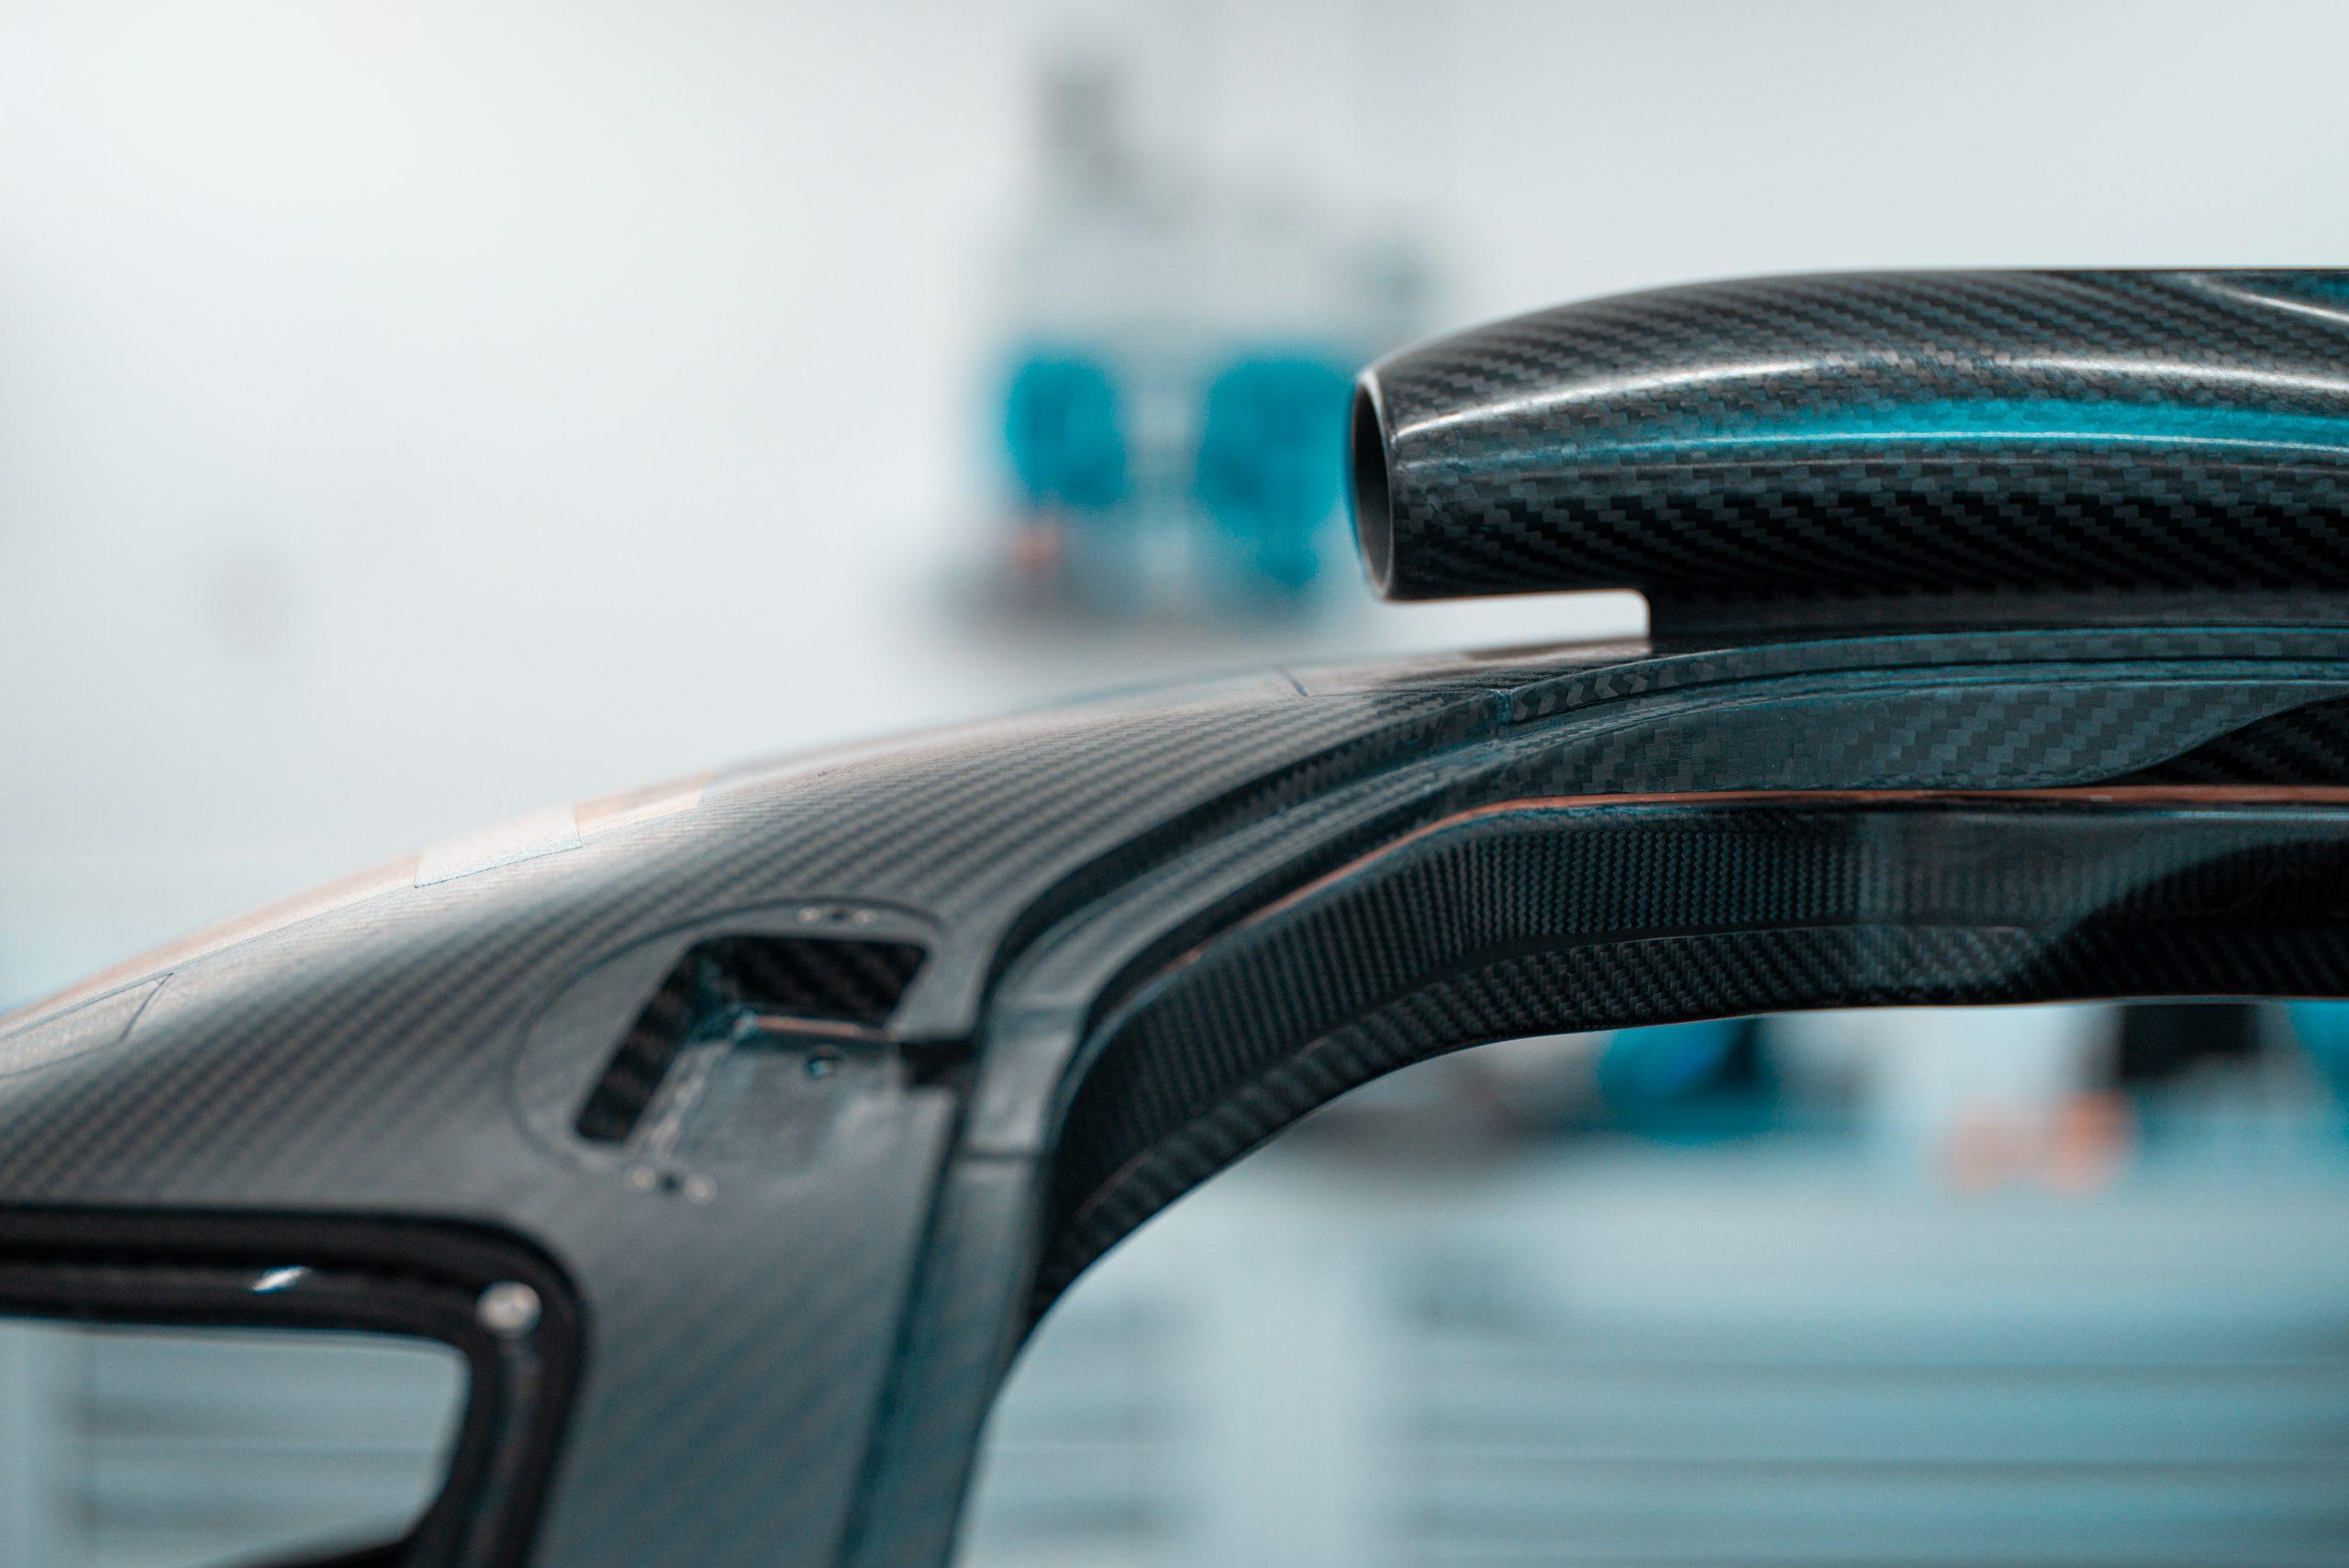 Glickenhaus 007 Hypercar LMH carbon fiber monocoque aero hood scoop